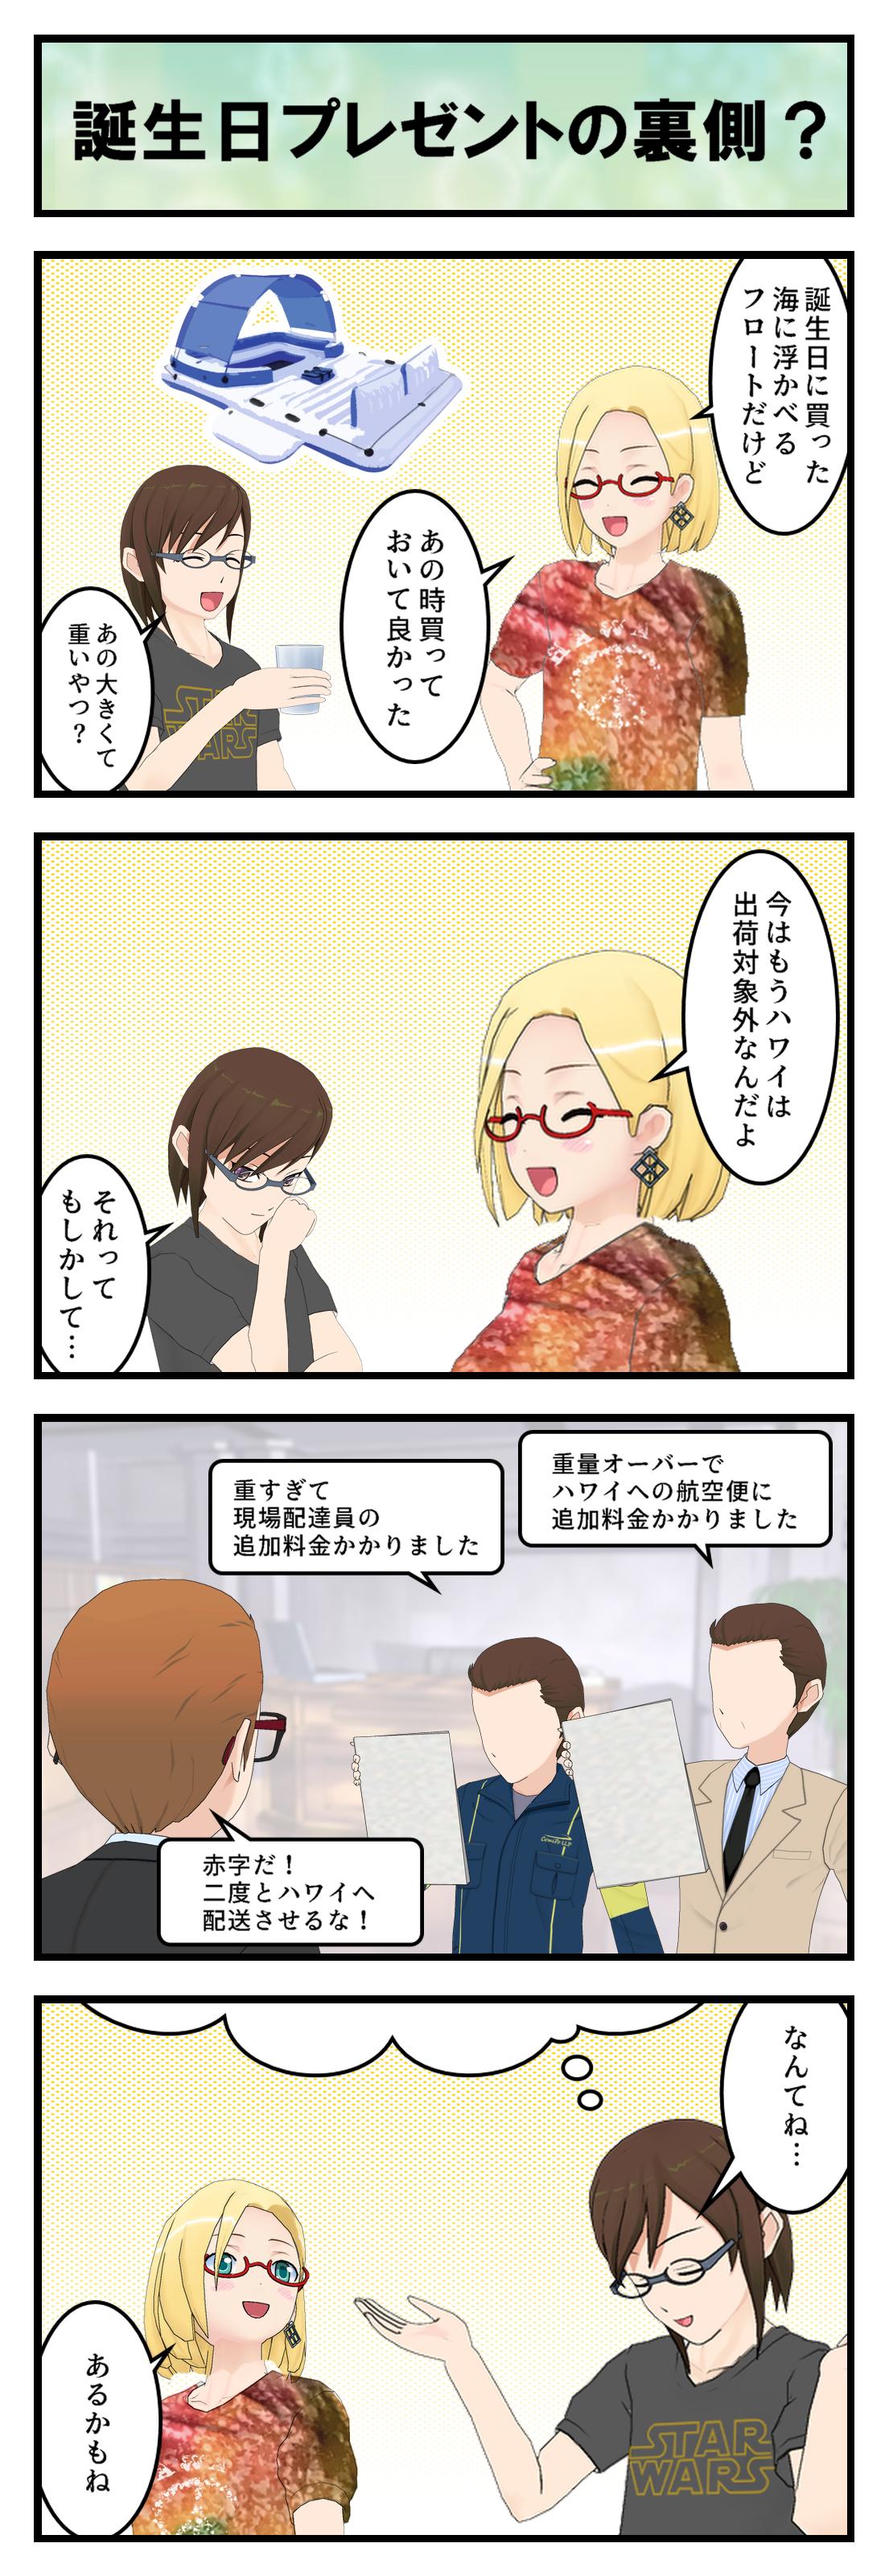 R086_誕生日プレゼント後日談_001